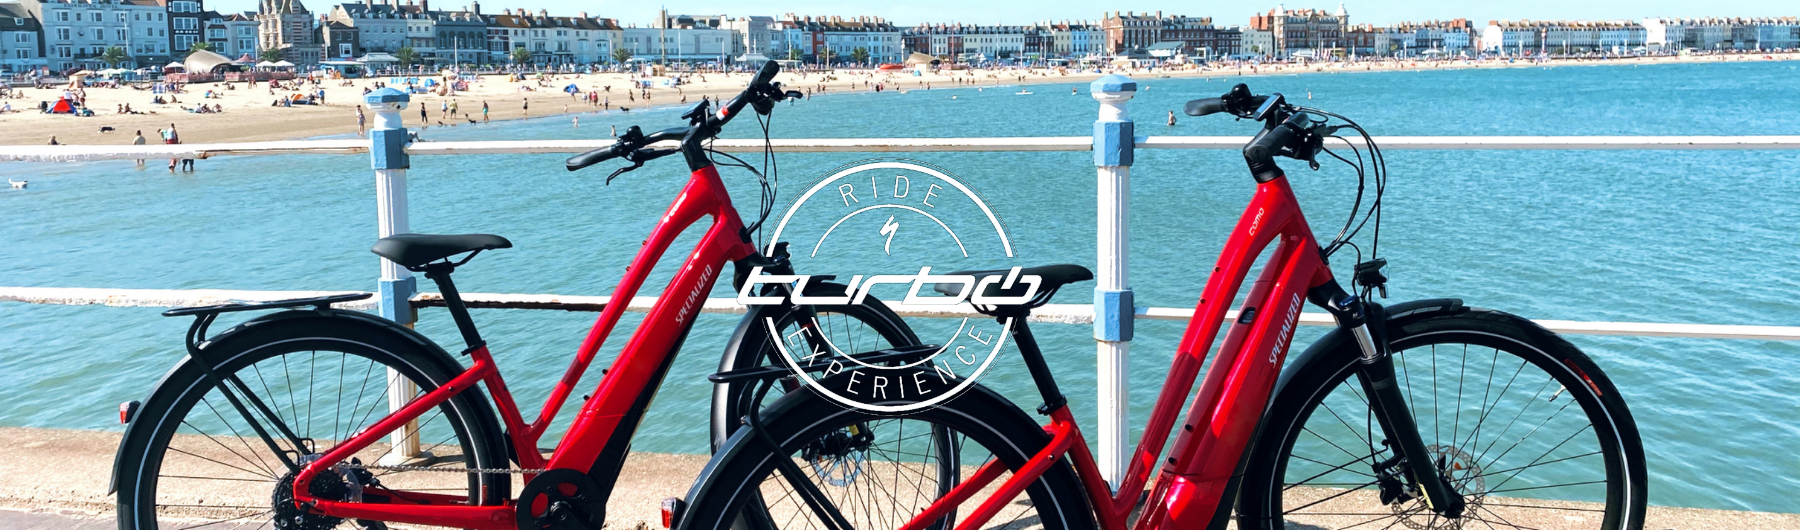 Specialized e-Bike Ride Experience - Weymouth